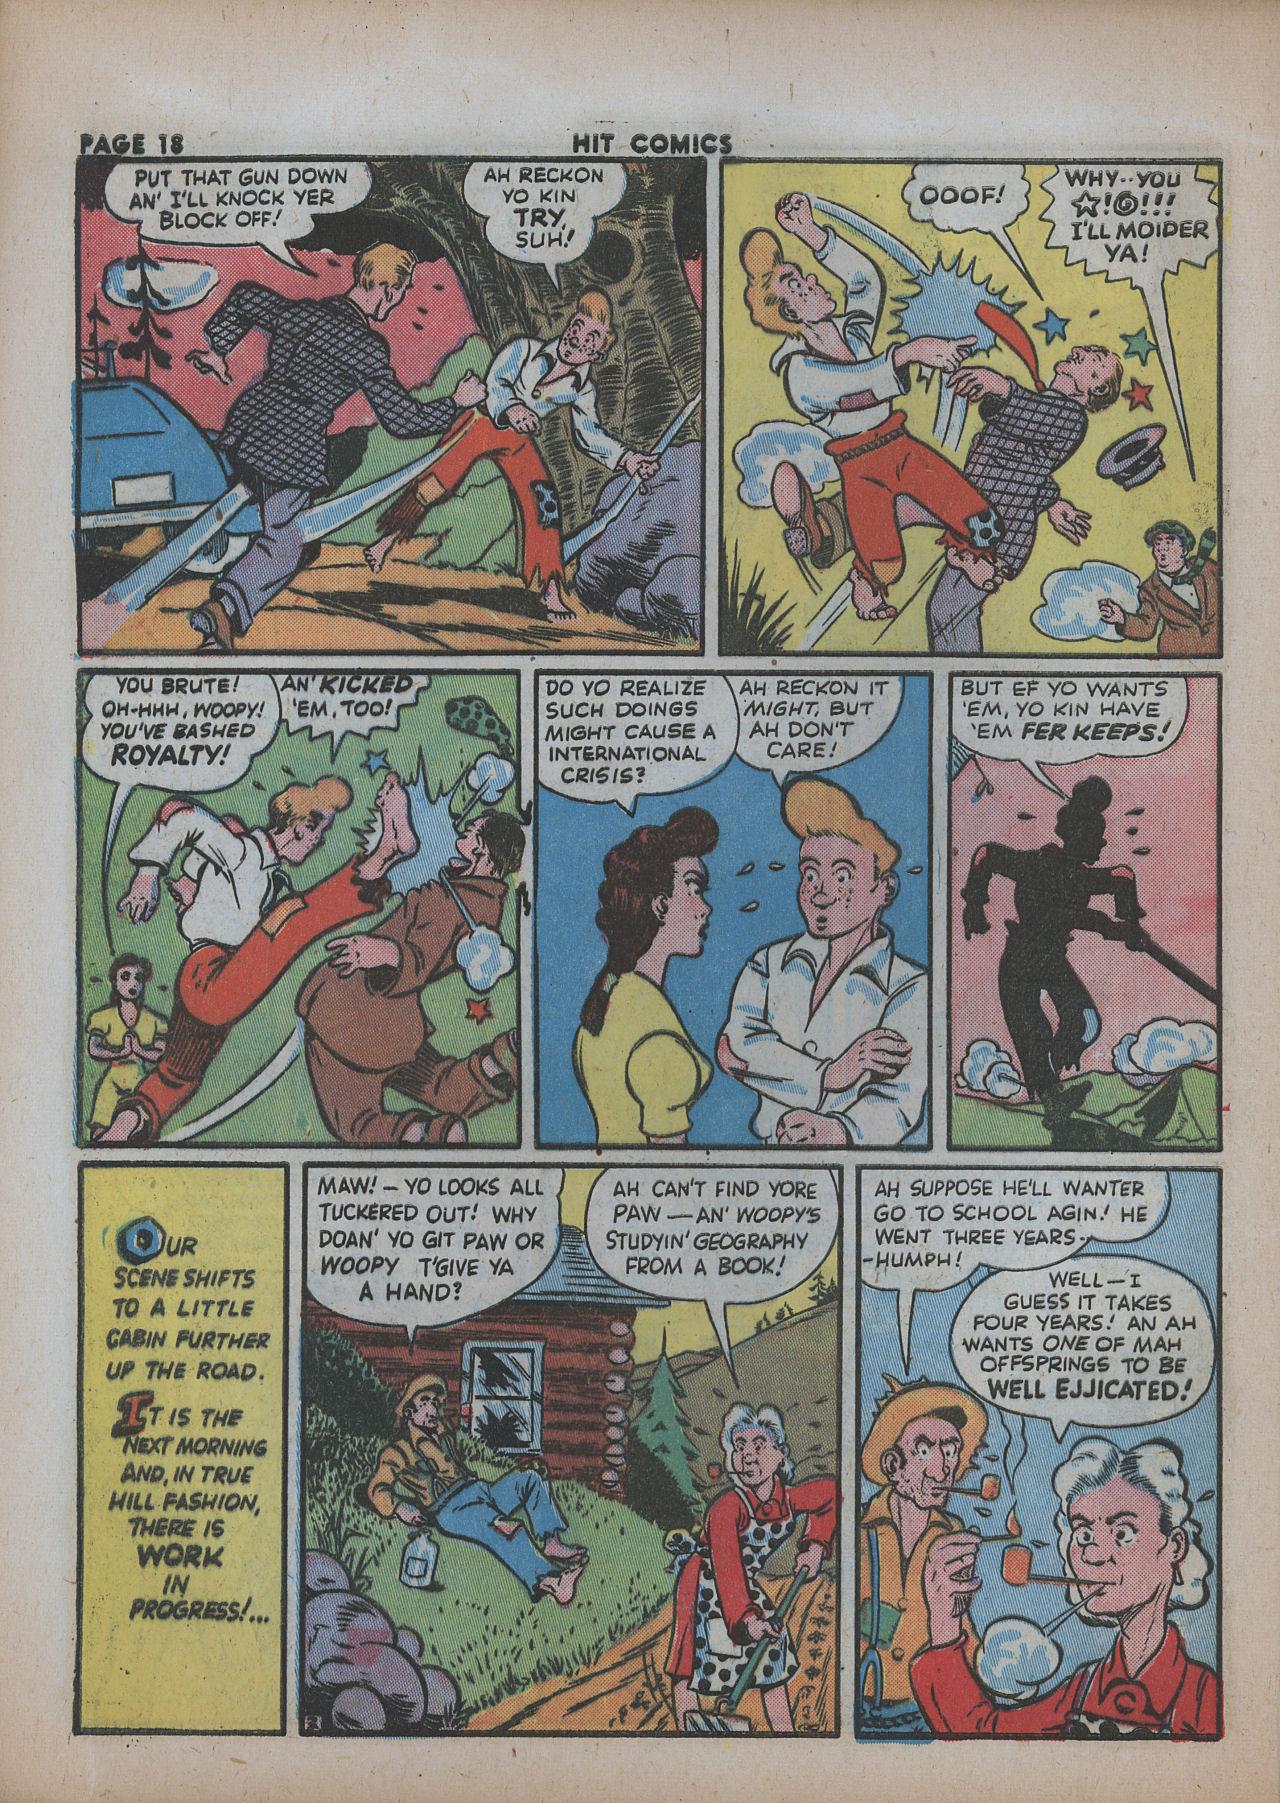 Read online Hit Comics comic -  Issue #26 - 20